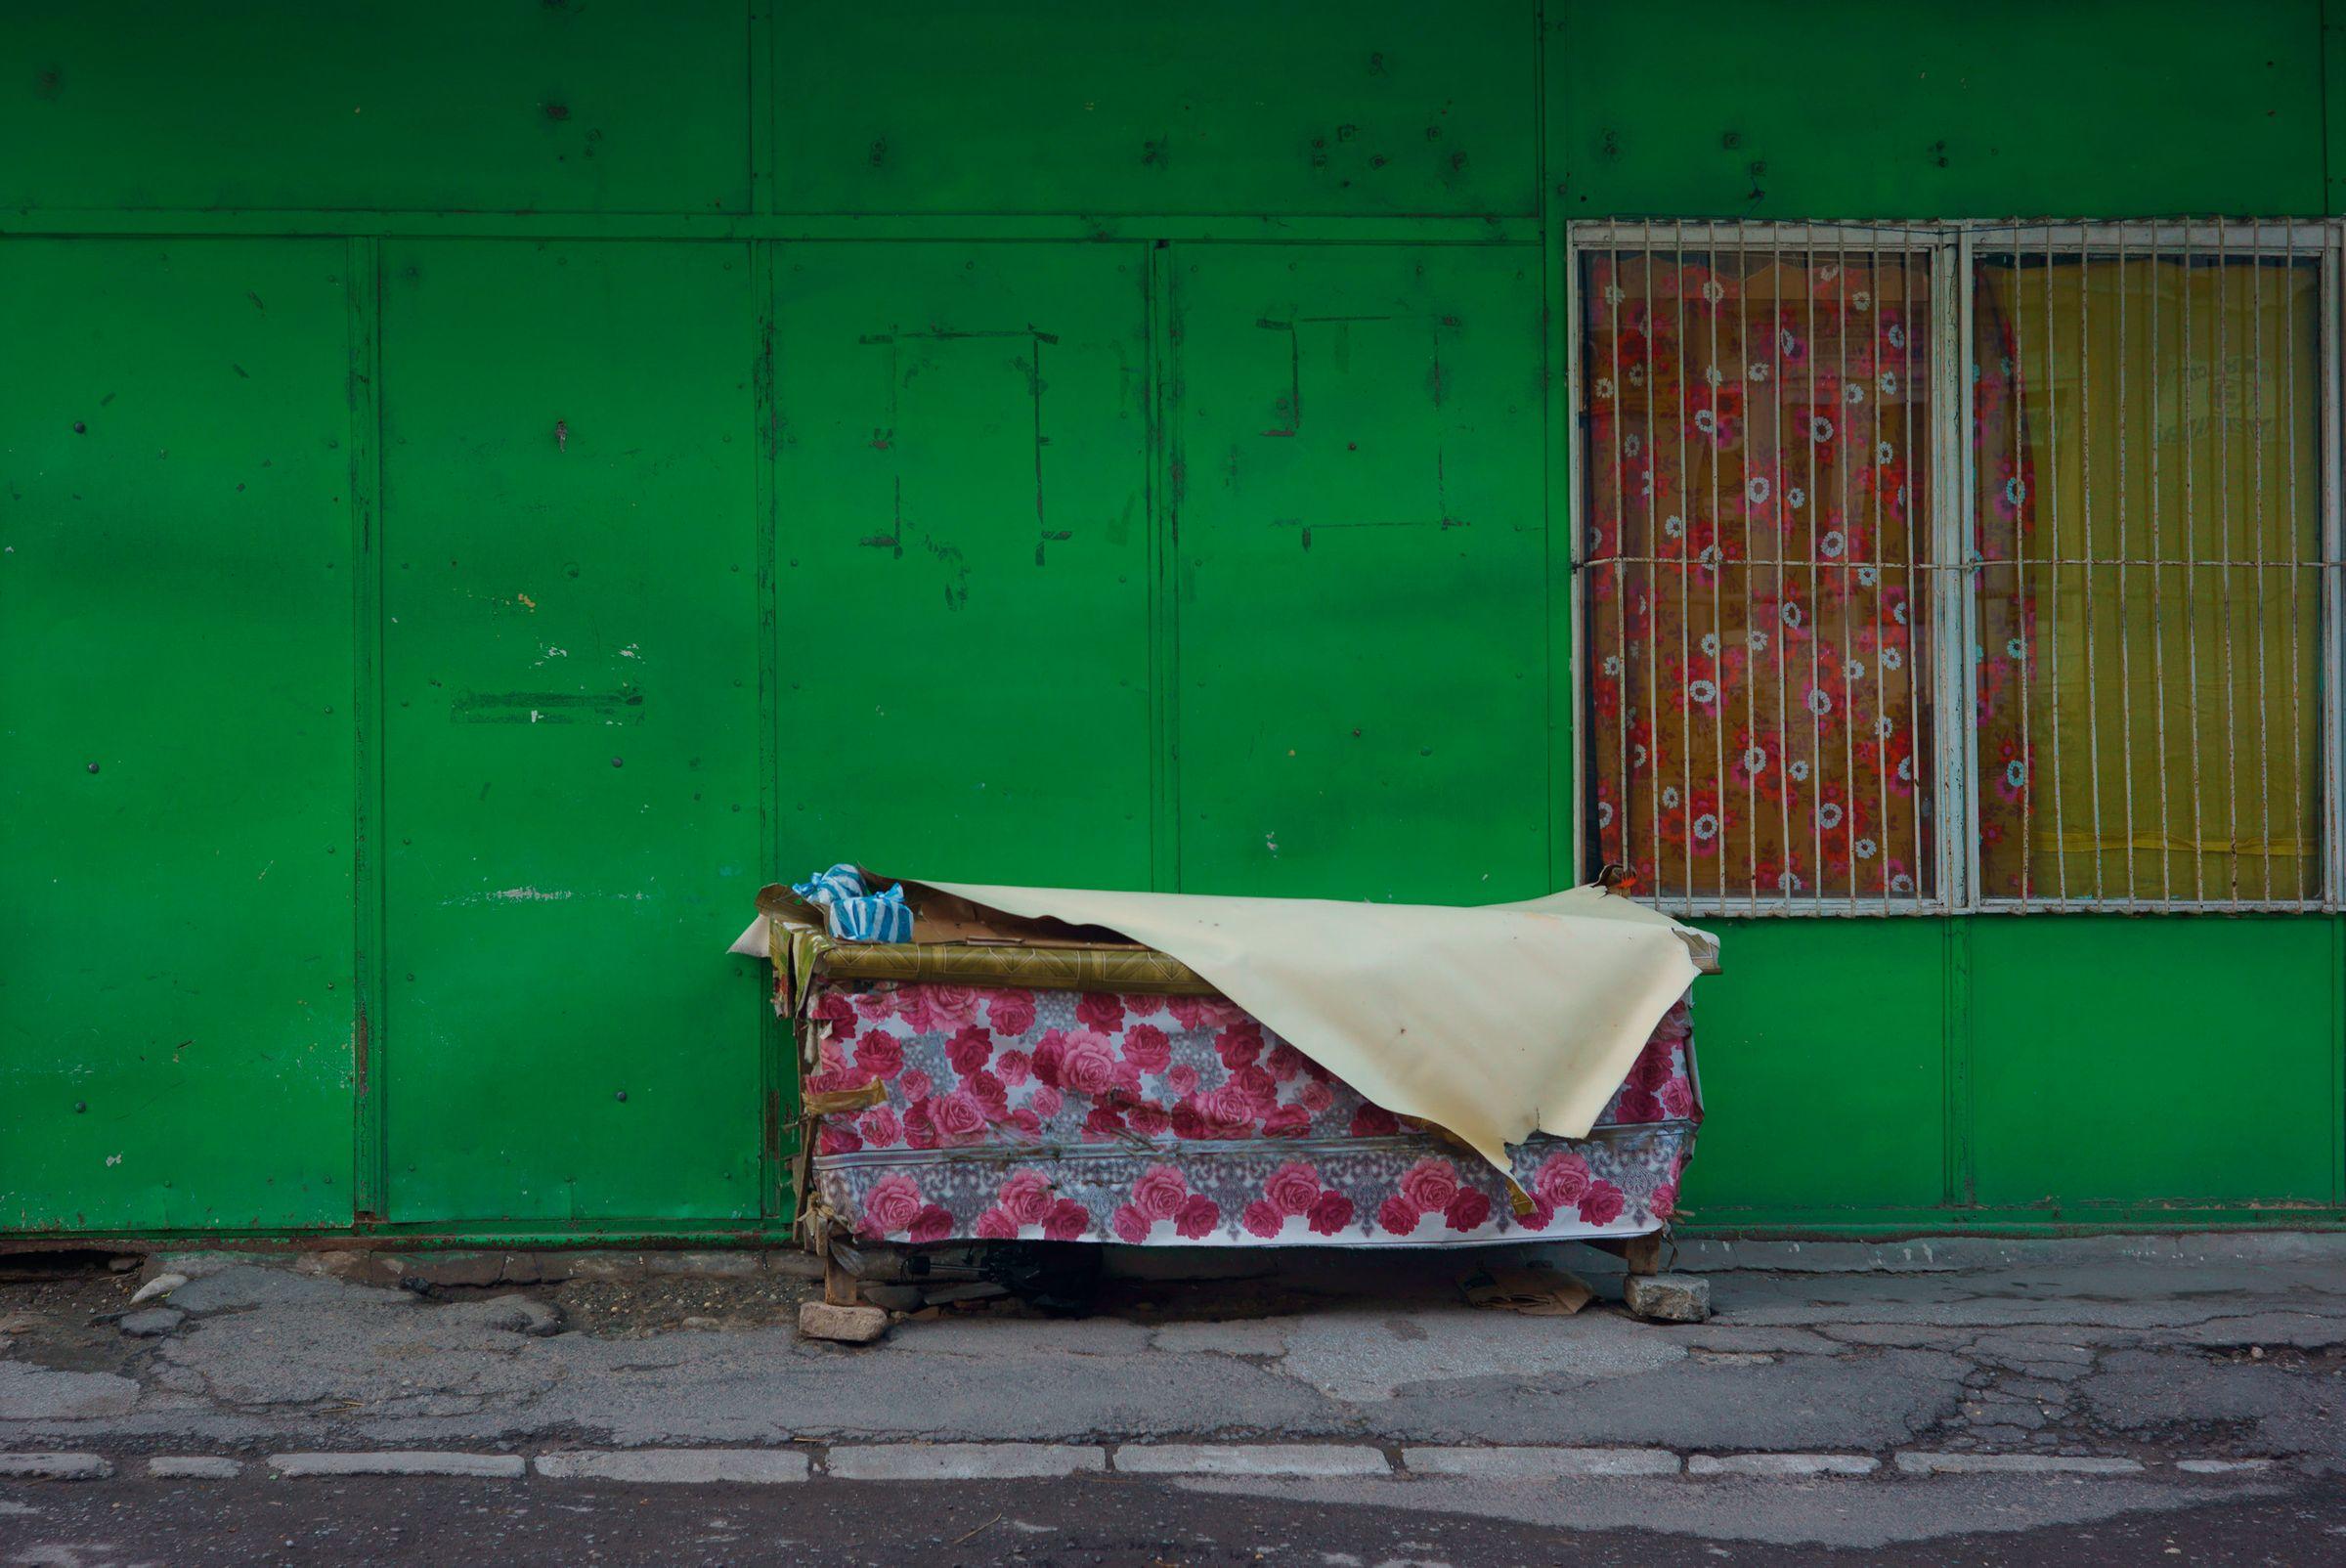 Market Dumpster, SIbui